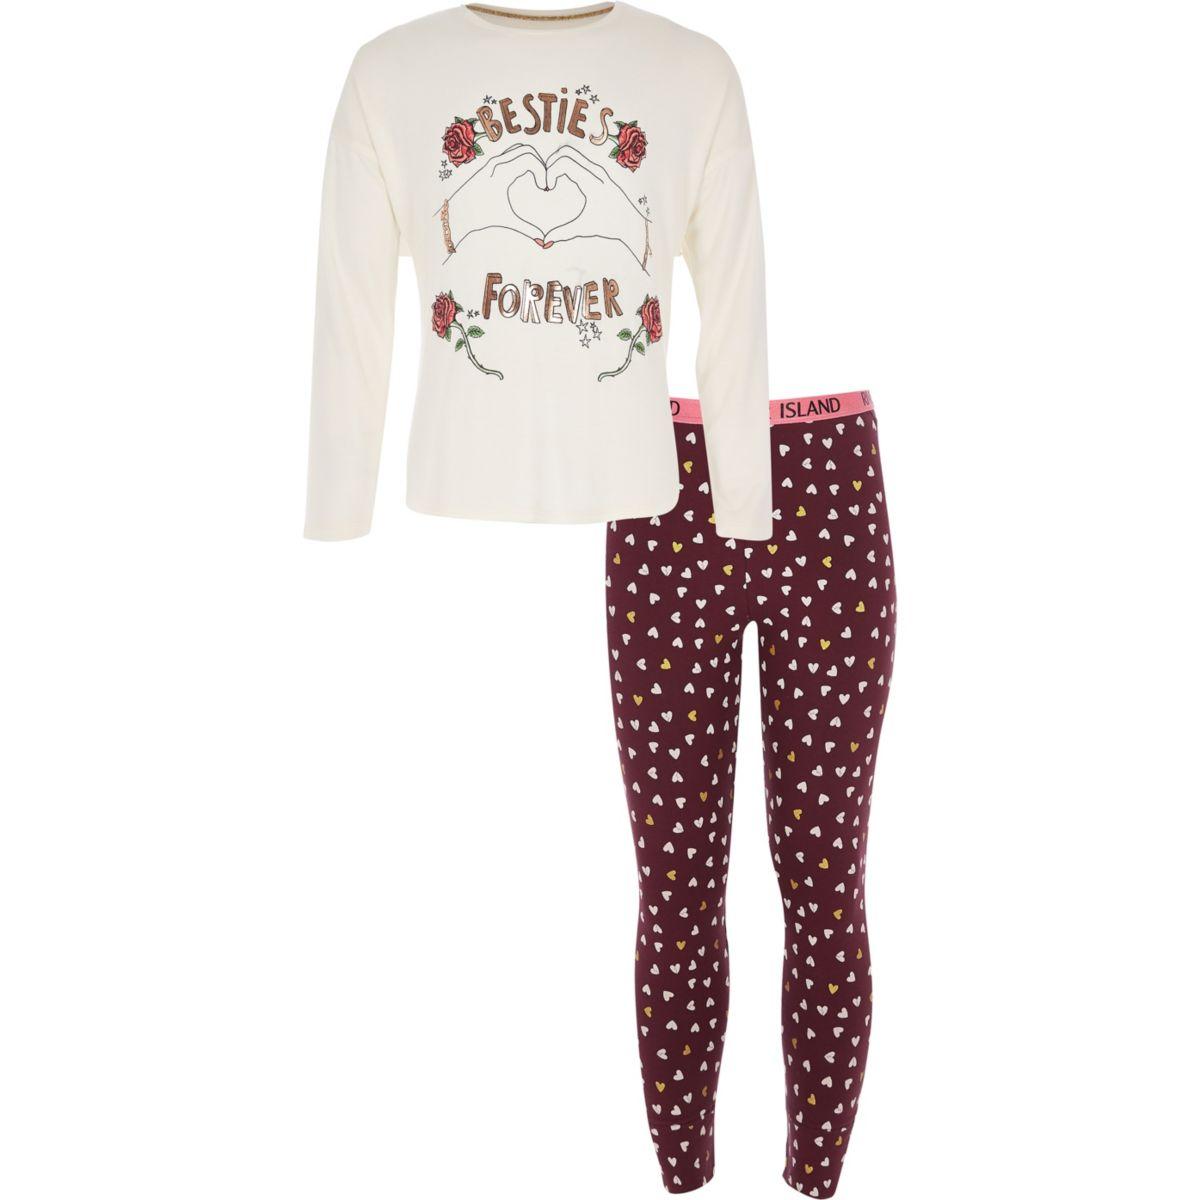 Girls red 'Besties forever' pyjama set